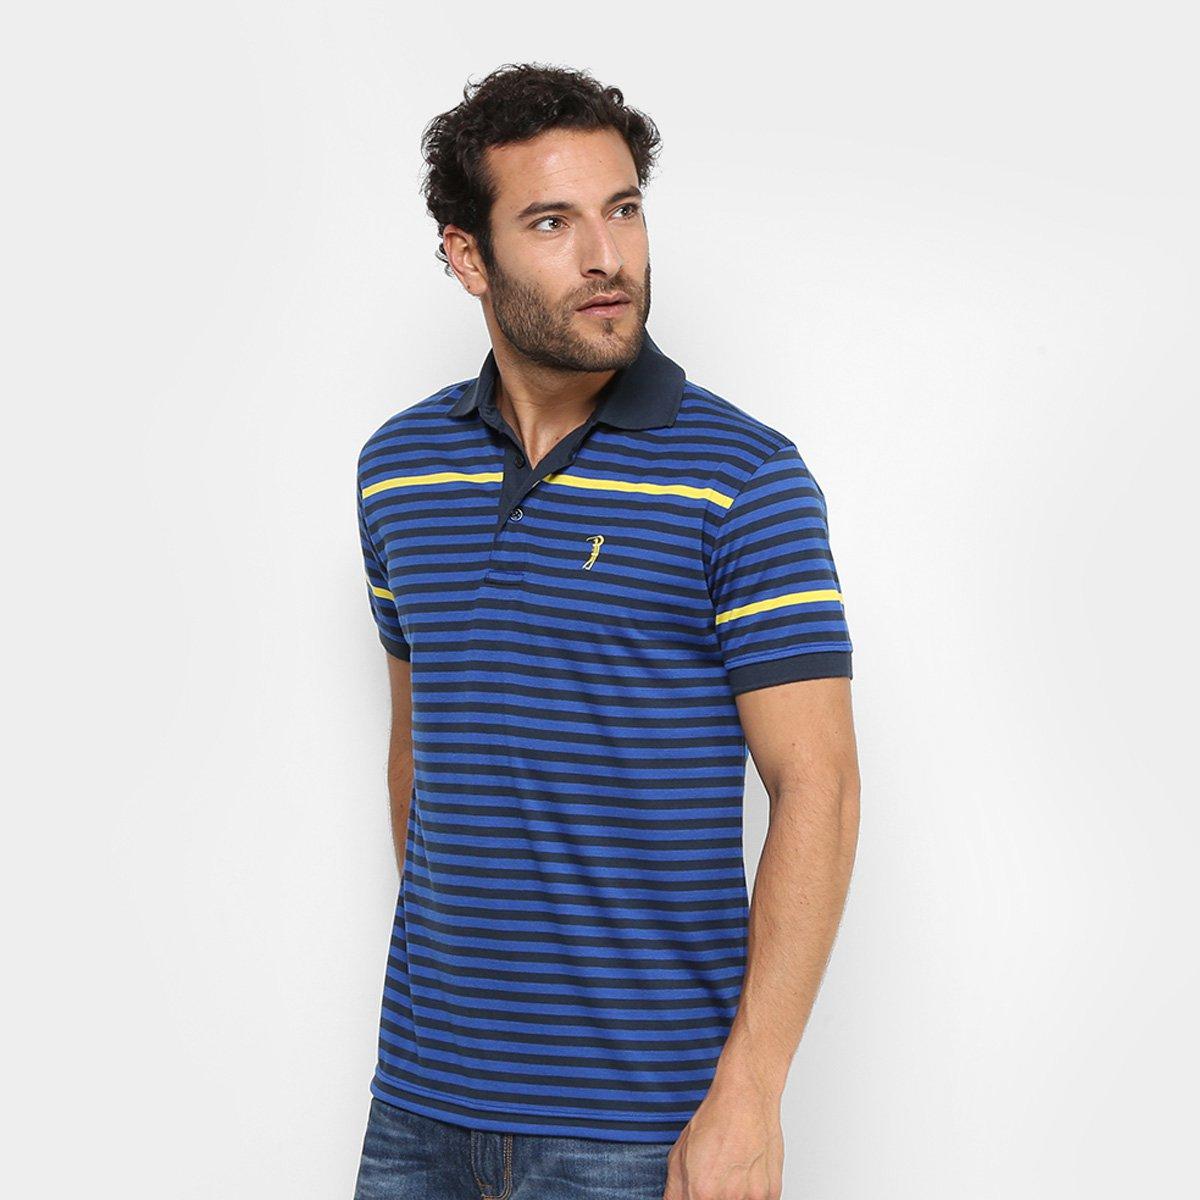 Camisa Polo Aleatory Malha Listras Masculina 60d6e7f7c6081